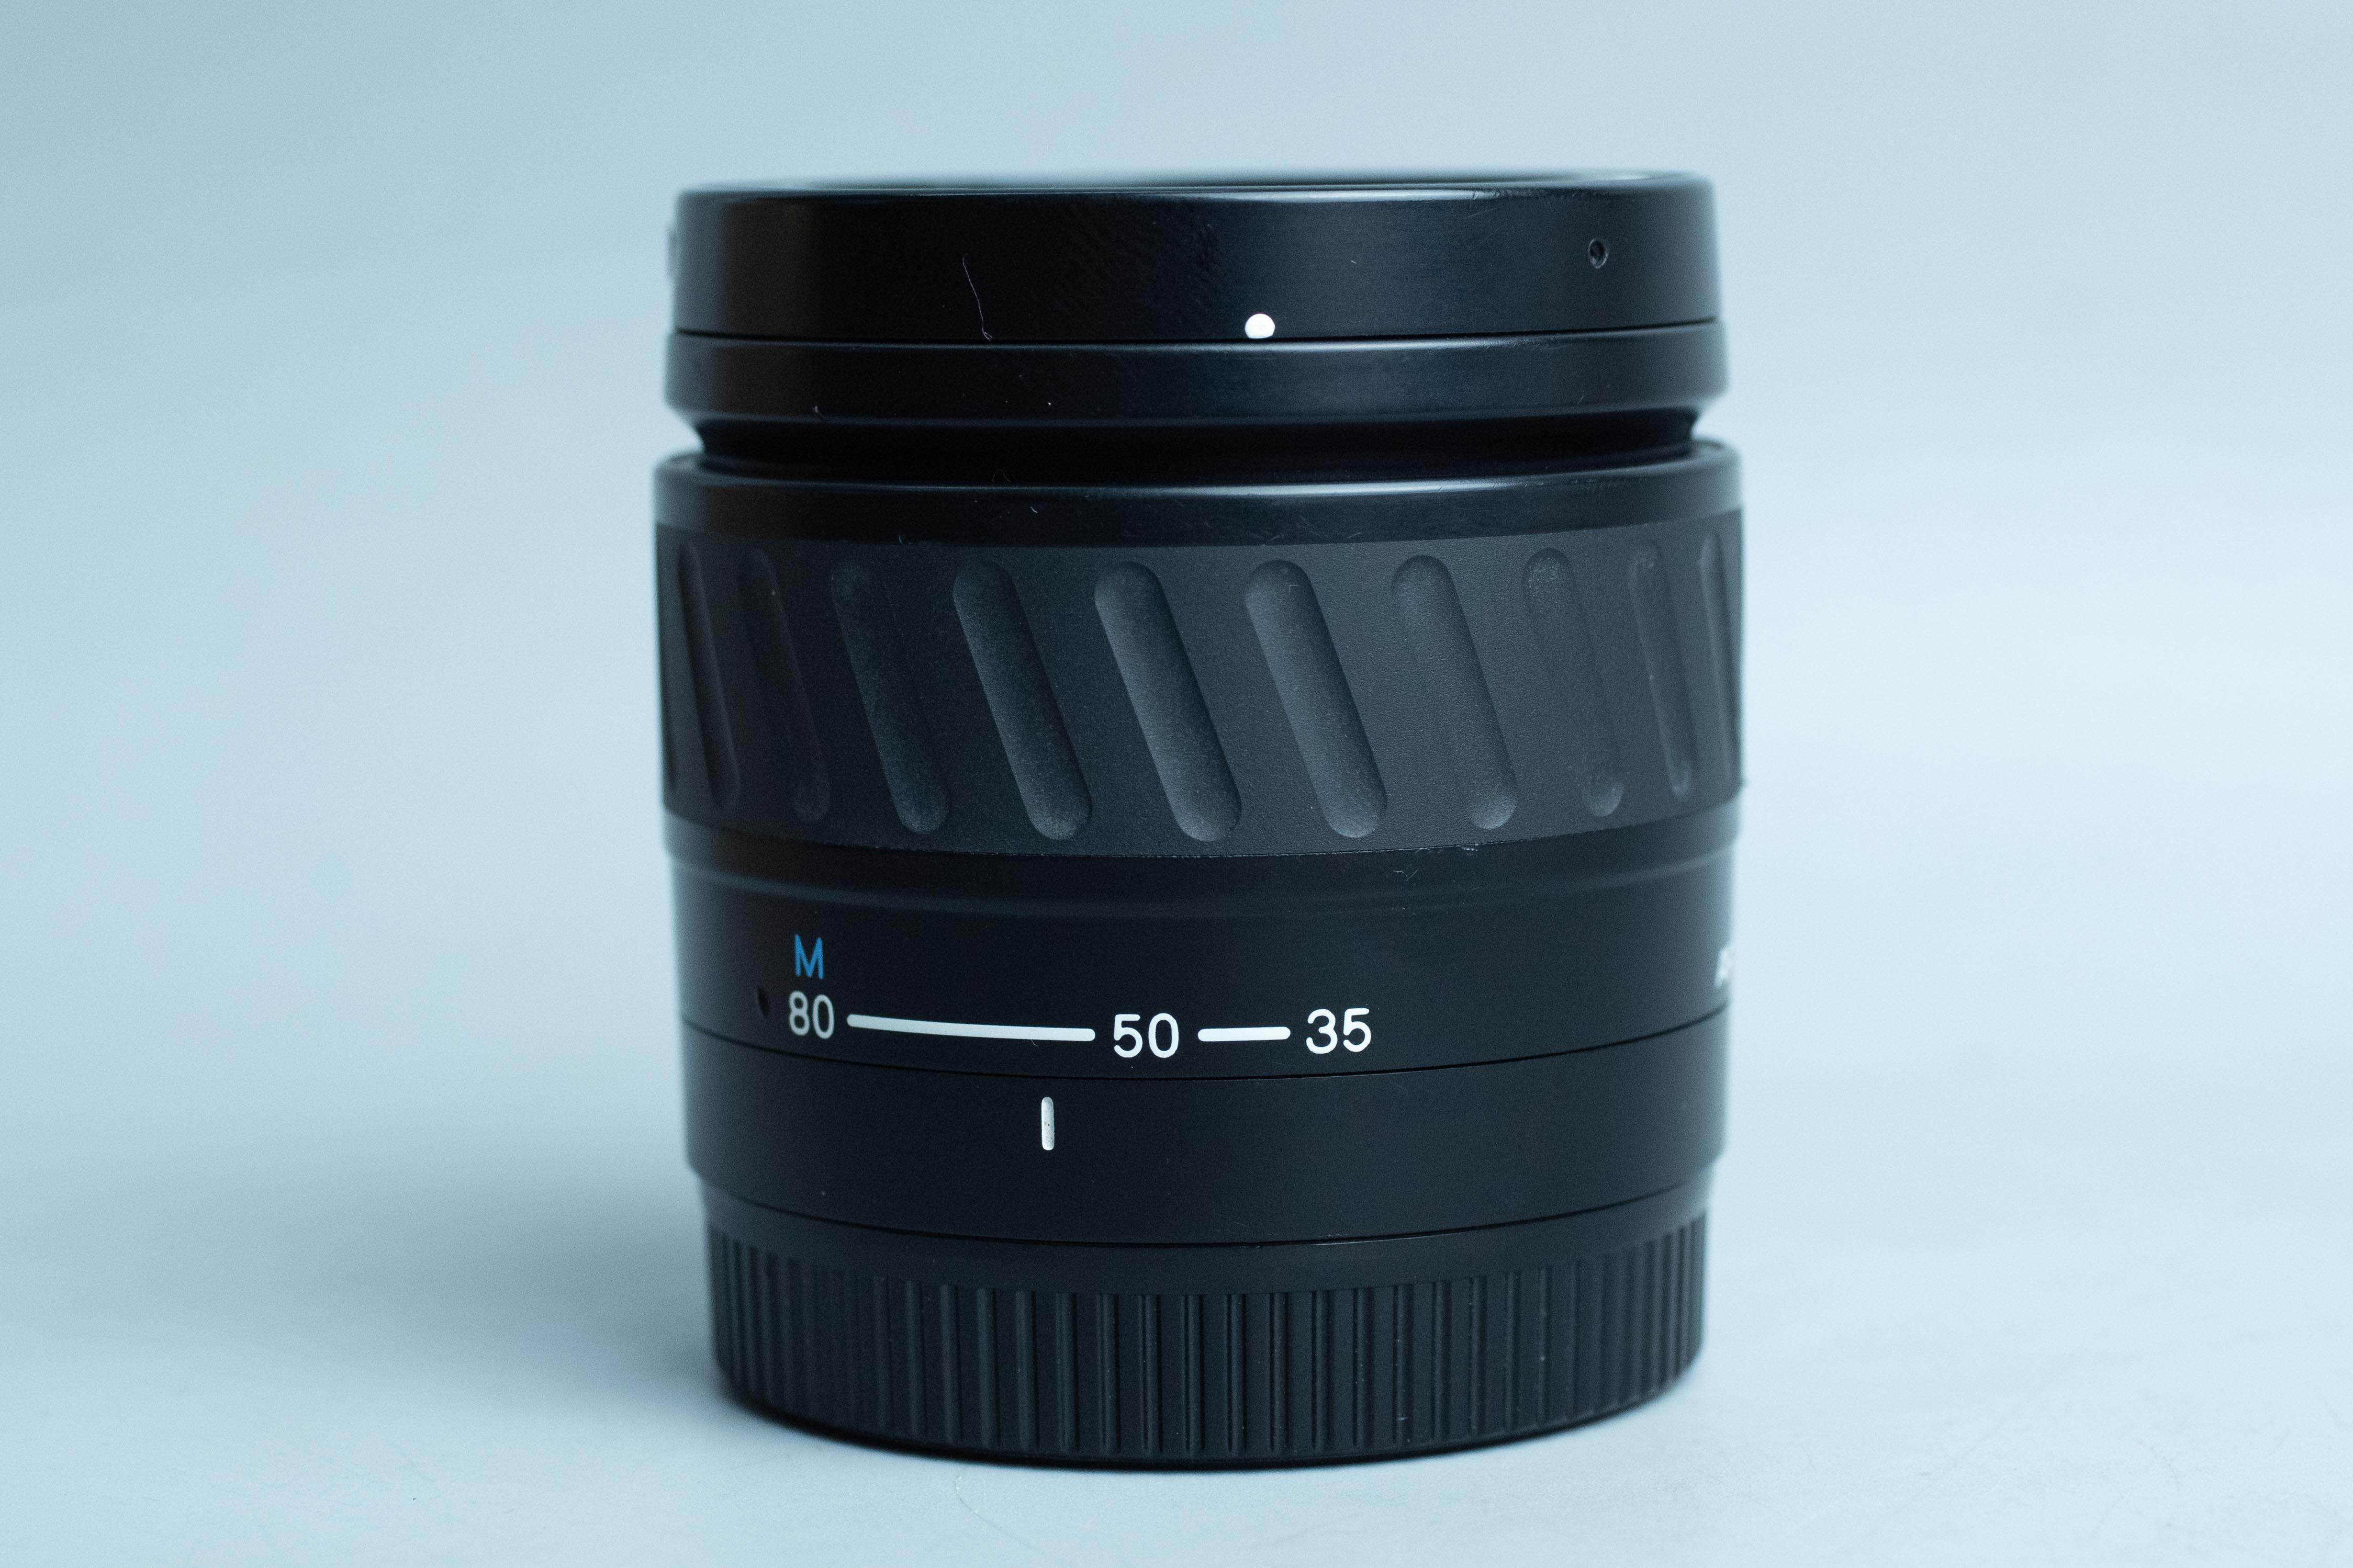 minolta-maxxum-35-80mm-f4-5-6-af-sony-a-35-80-4-5-6-17914